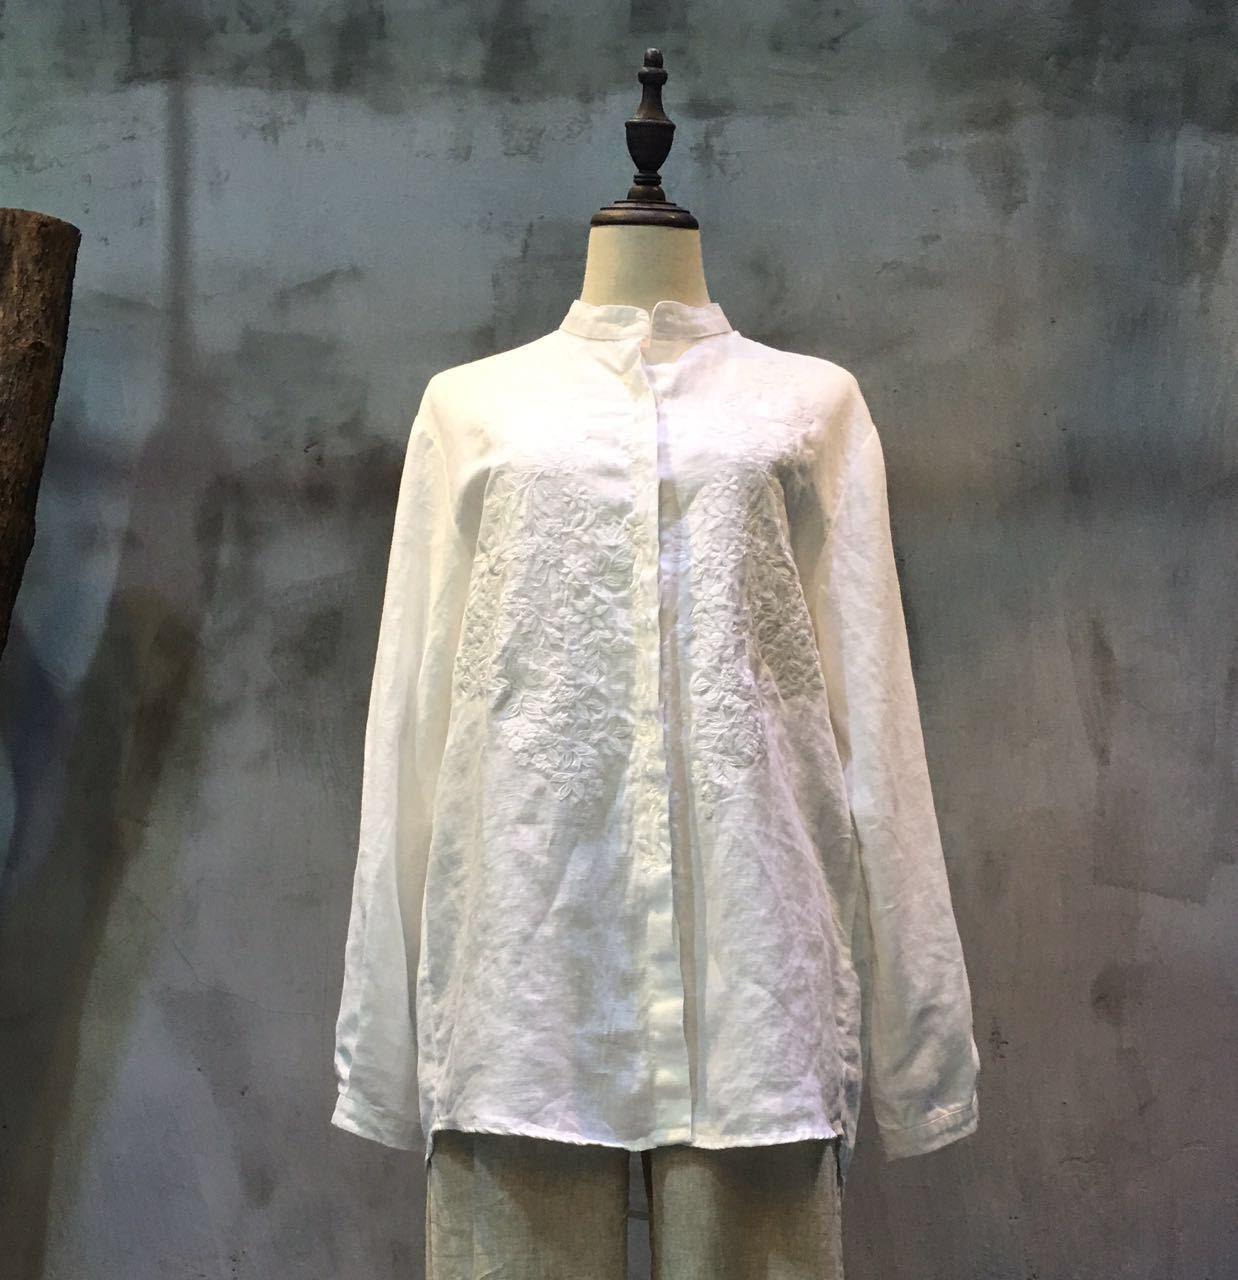 Best-Selling Flower Embroidery Cotton Linen Blouse Womans Decent Clothes  #white #blouse #shirt #top #embroidery #cottonlinen #amazing #decent #elegant